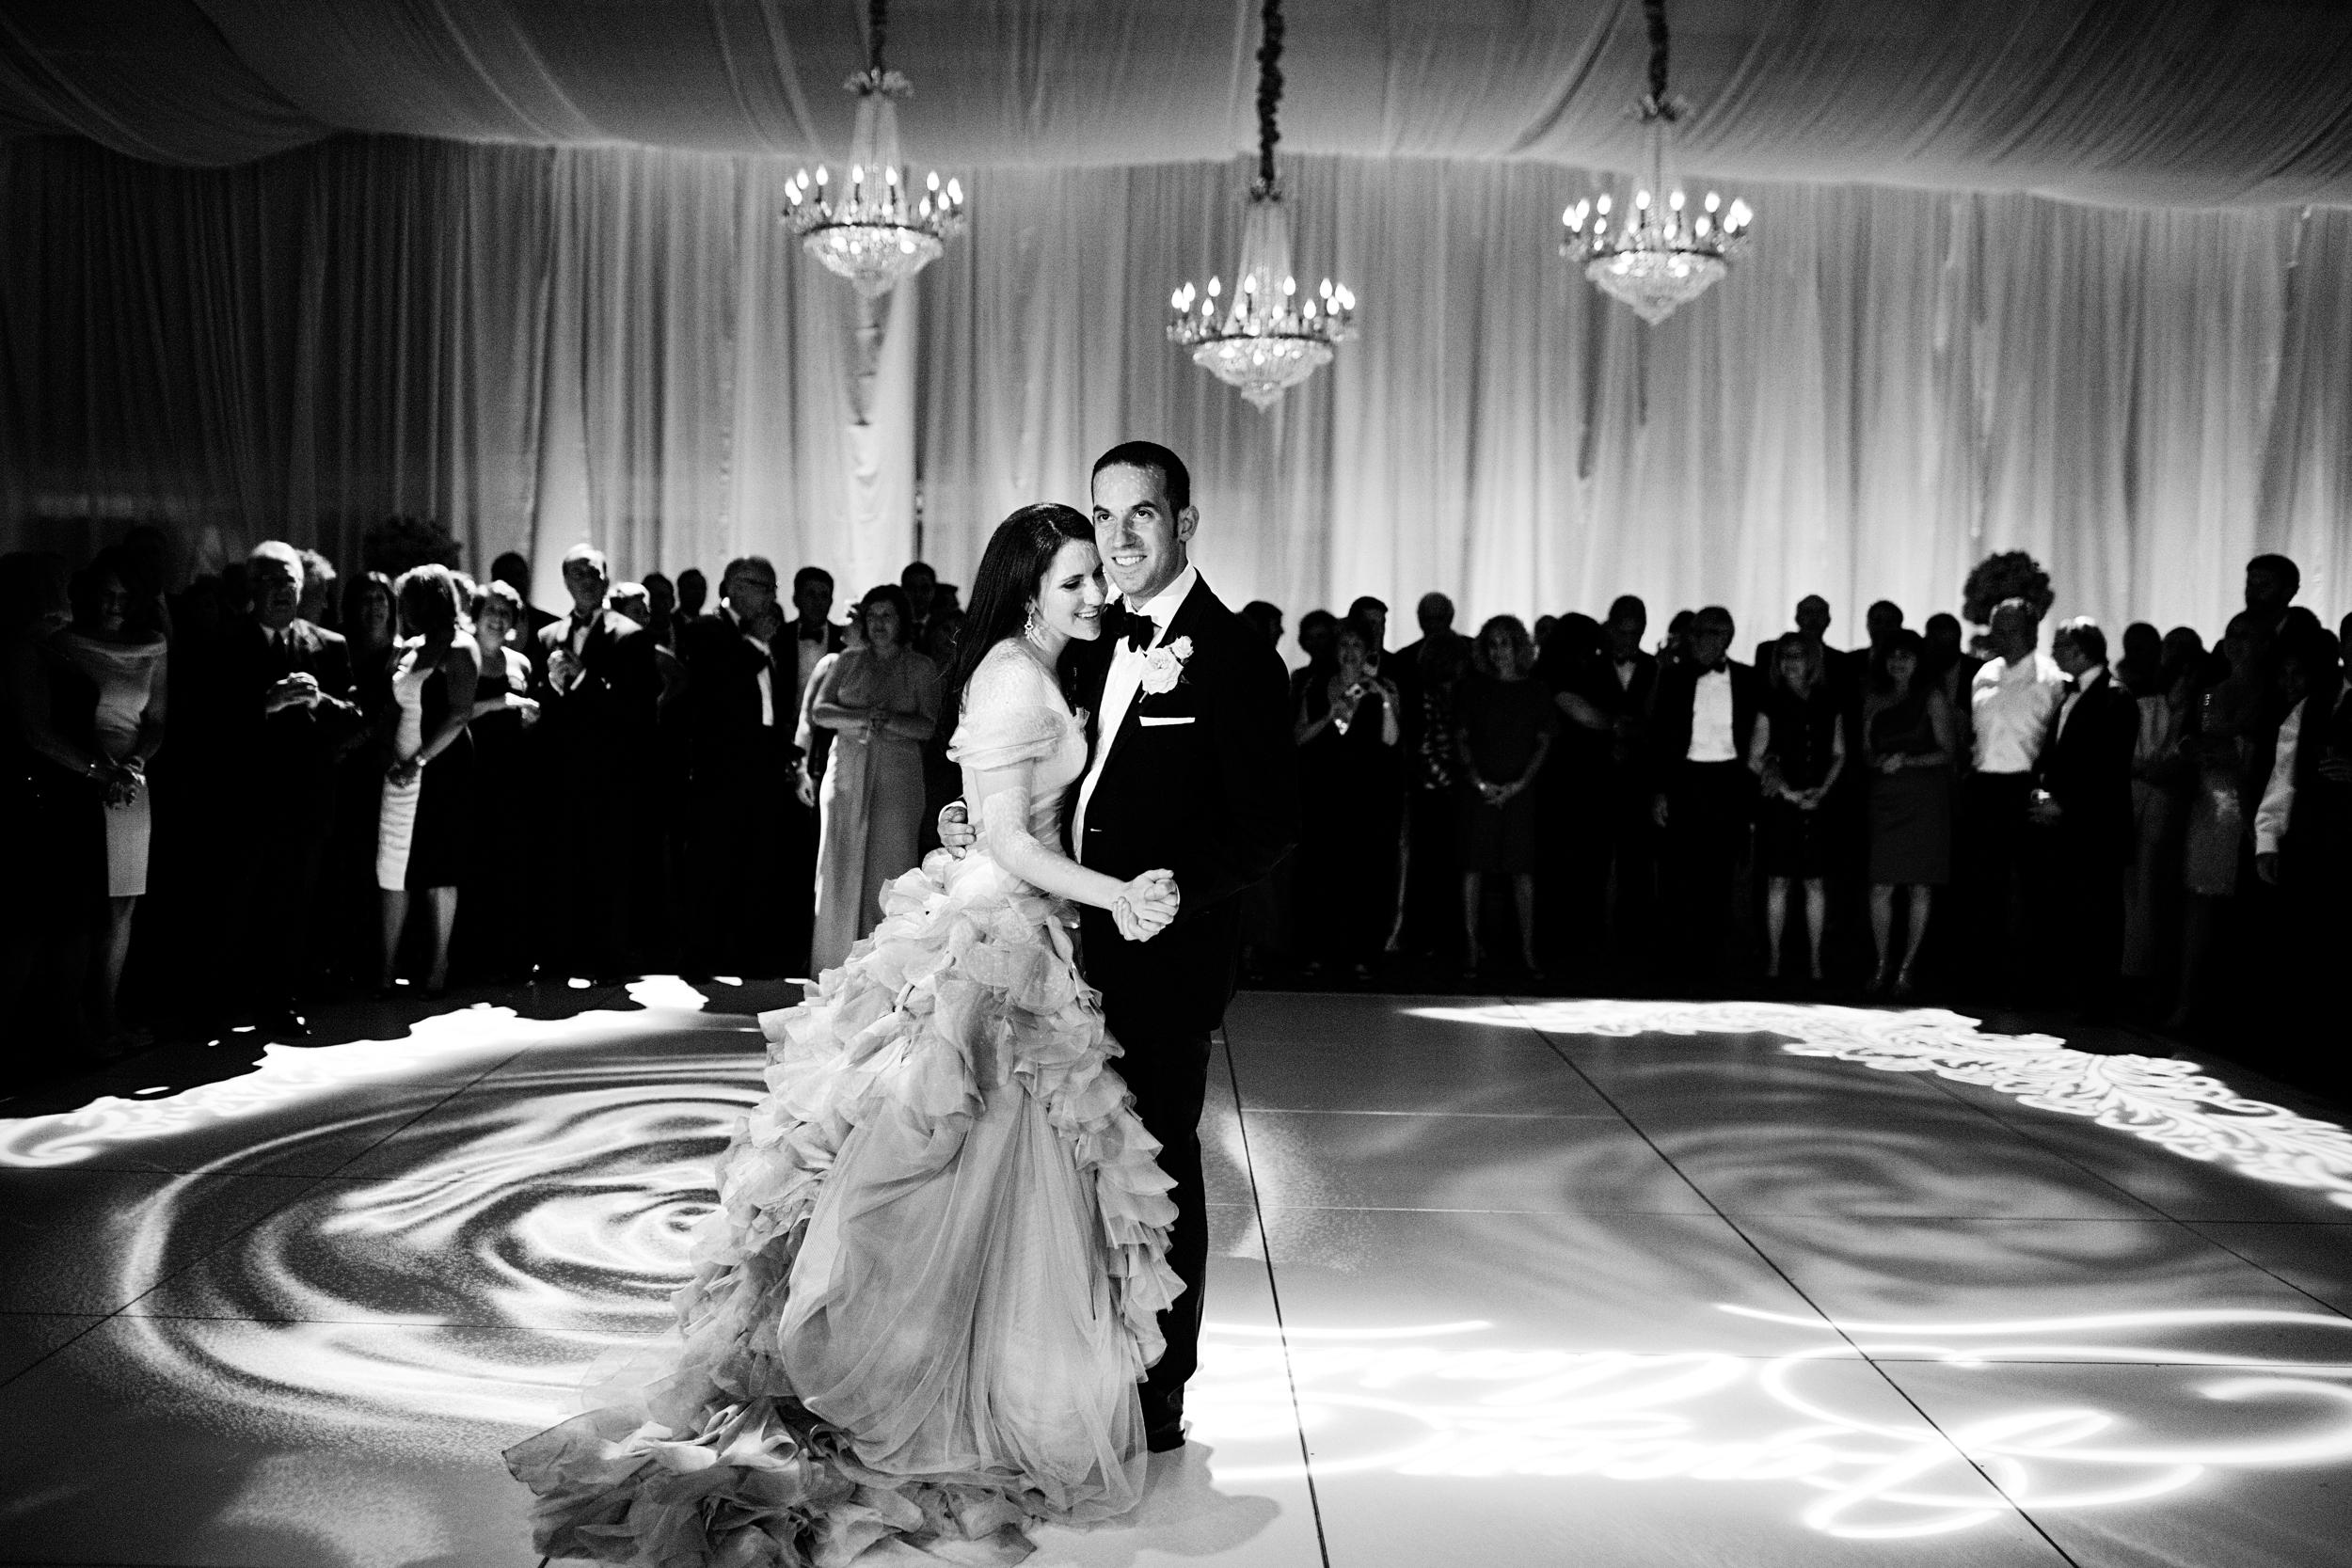 Ceci_New_York_Ceci_Style_Ceci_Johnson_Luxury_Lifestyle_Floral_Lace_Wedding_Letterpress_Inspiration_Design_Custom_Couture_Personalized_Invitations_-89.jpg